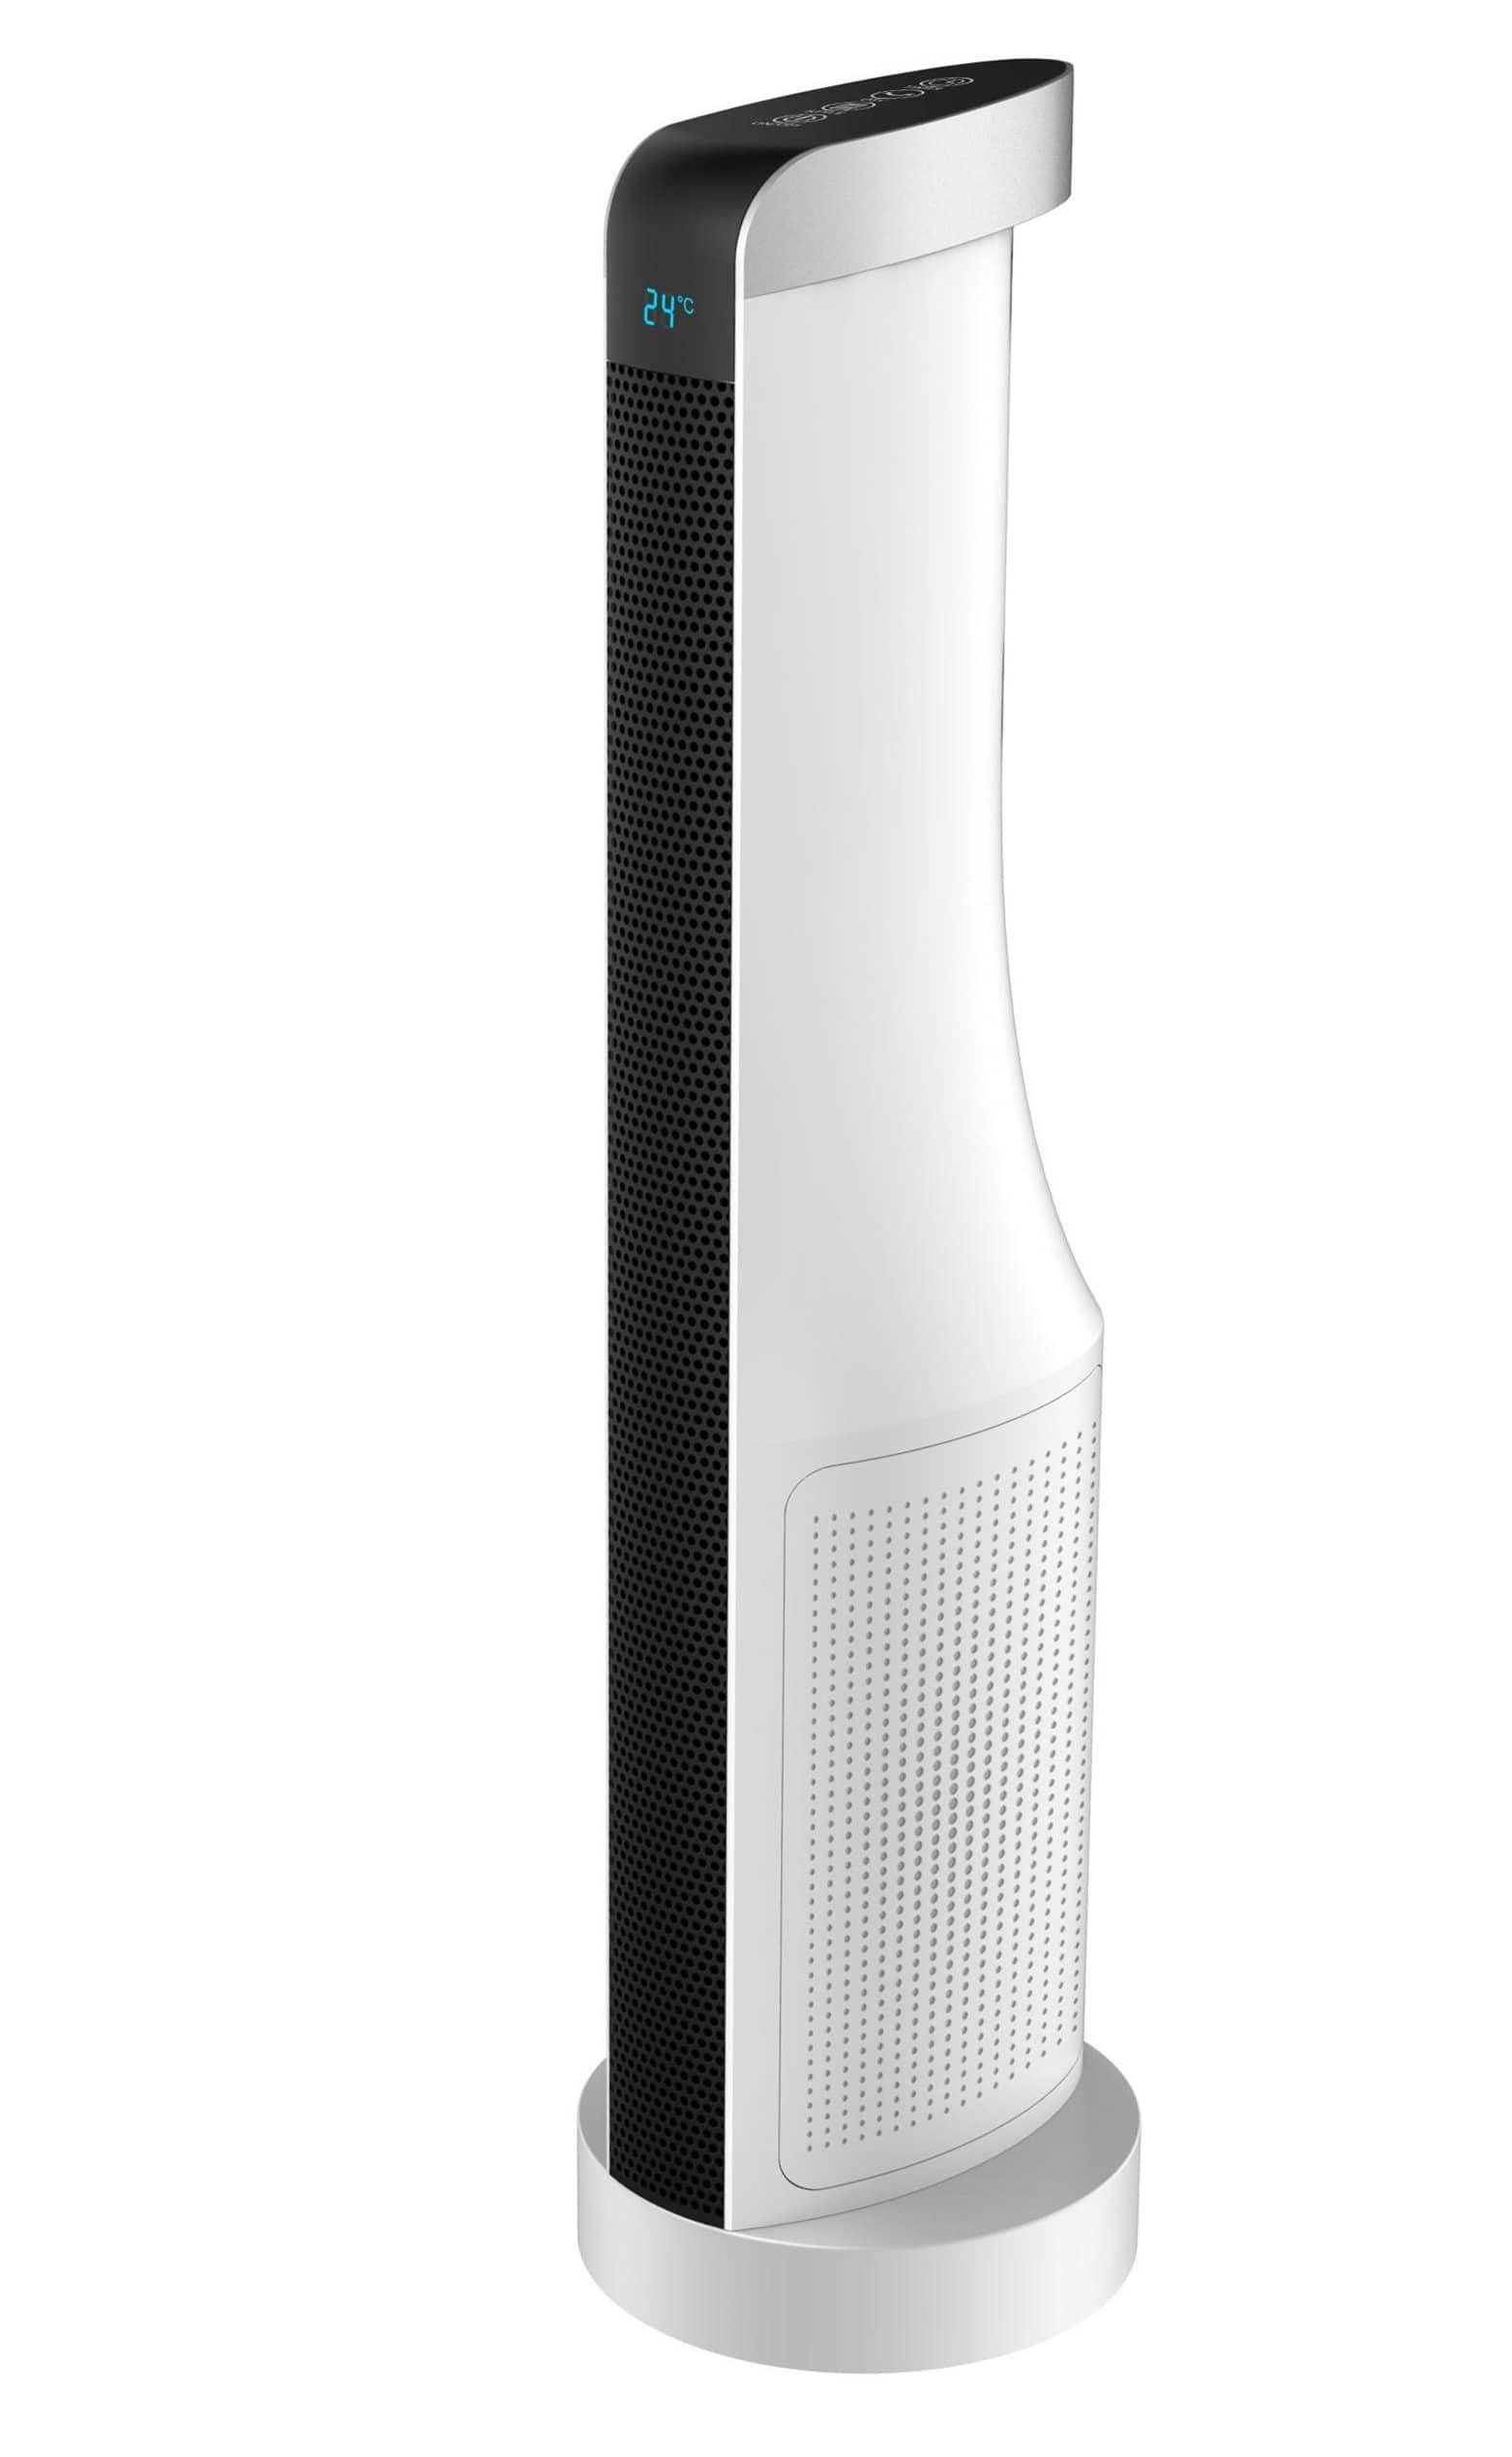 SUNTEC 13058 Heat PTC Prime 2000 KLIMATRONIC Turm-Stand-Heizlüfter für 159,99 Euro